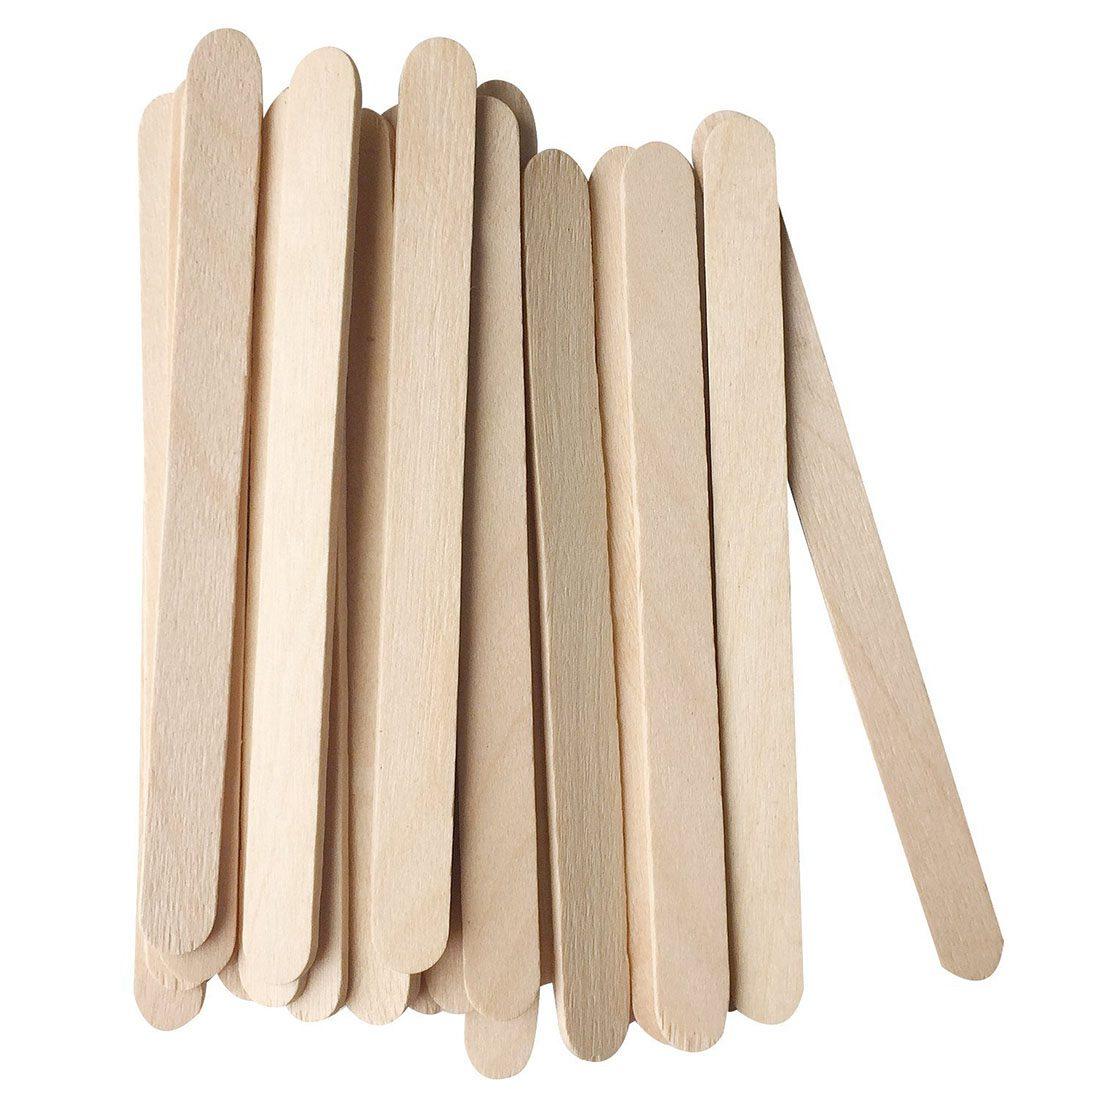 Hot Sale 200x Natural Wooden Ice Cream Sticks Treat Sticks Freezer Pop Sticks, 4.5 Inch Length wood color